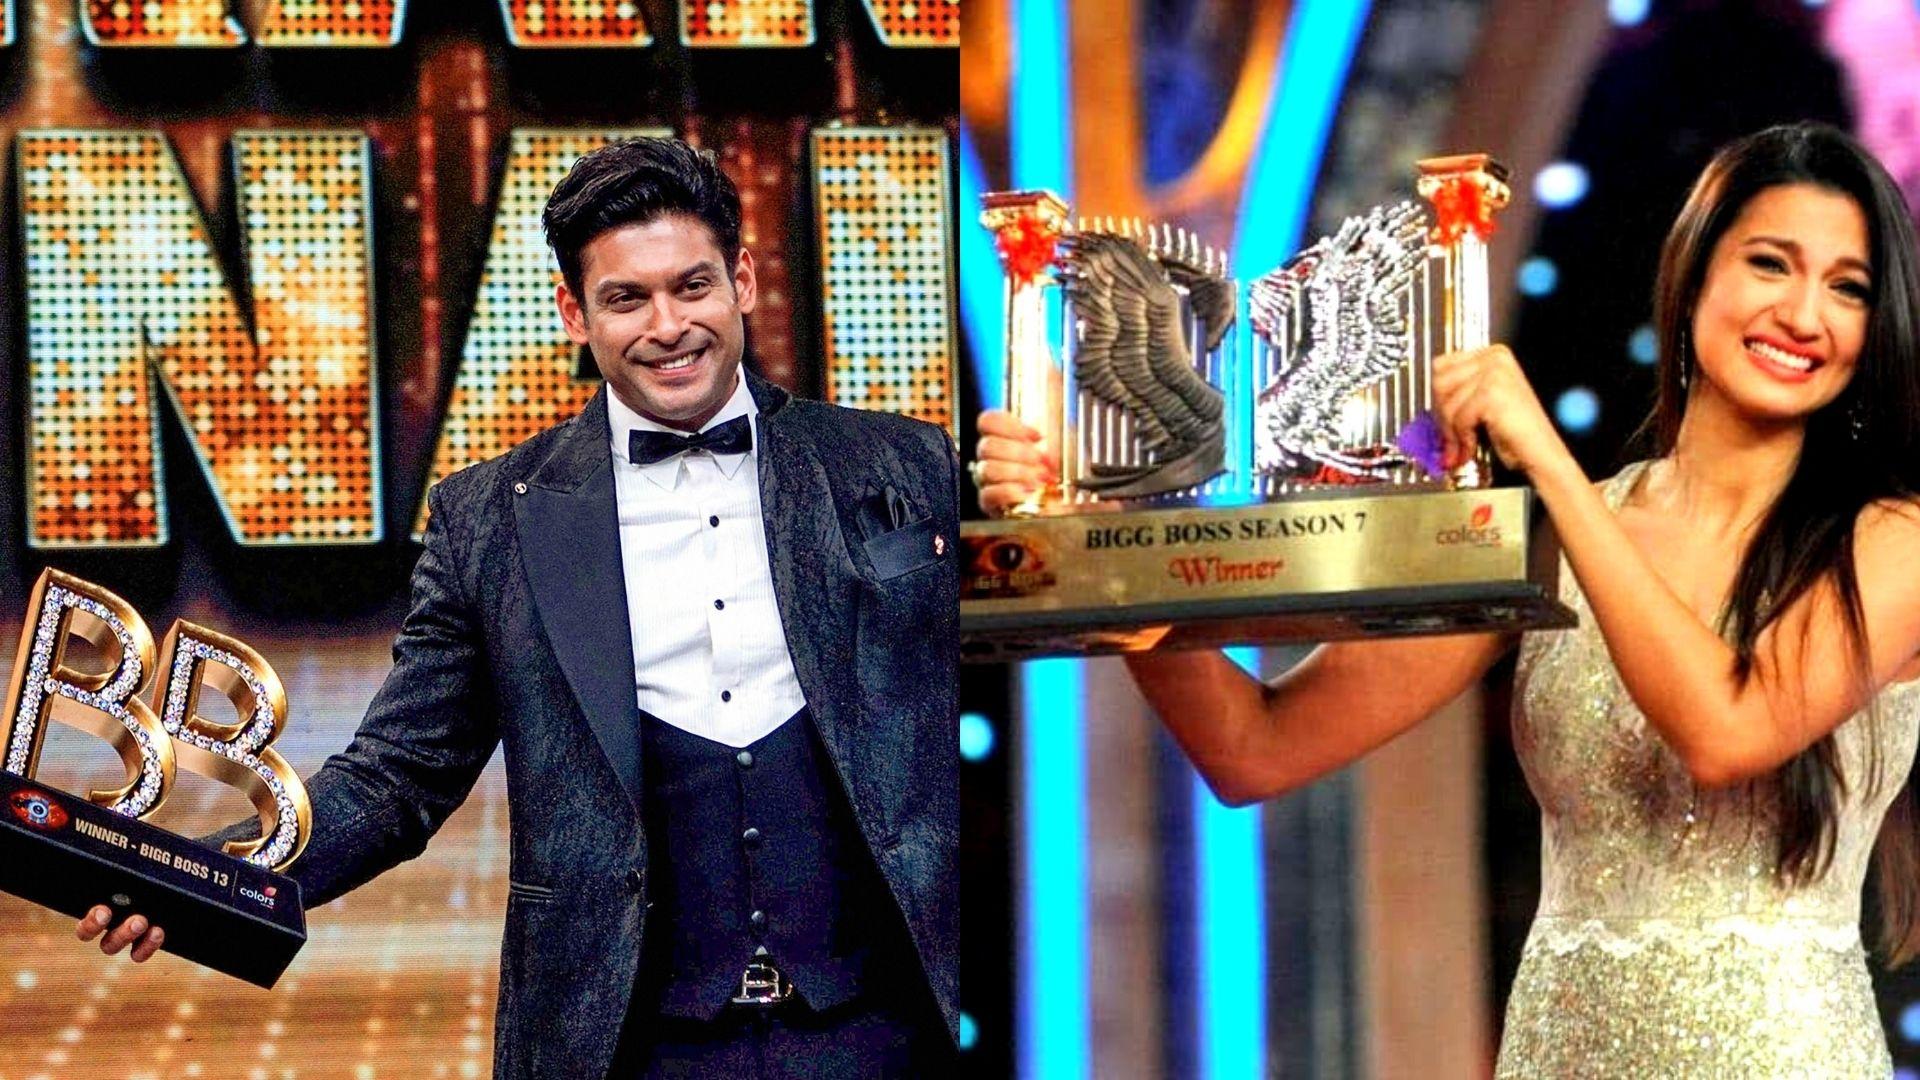 Bigg Boss 15: From Sidharth Shukla To Gauahar Khan – Here's The Winning Prize Money